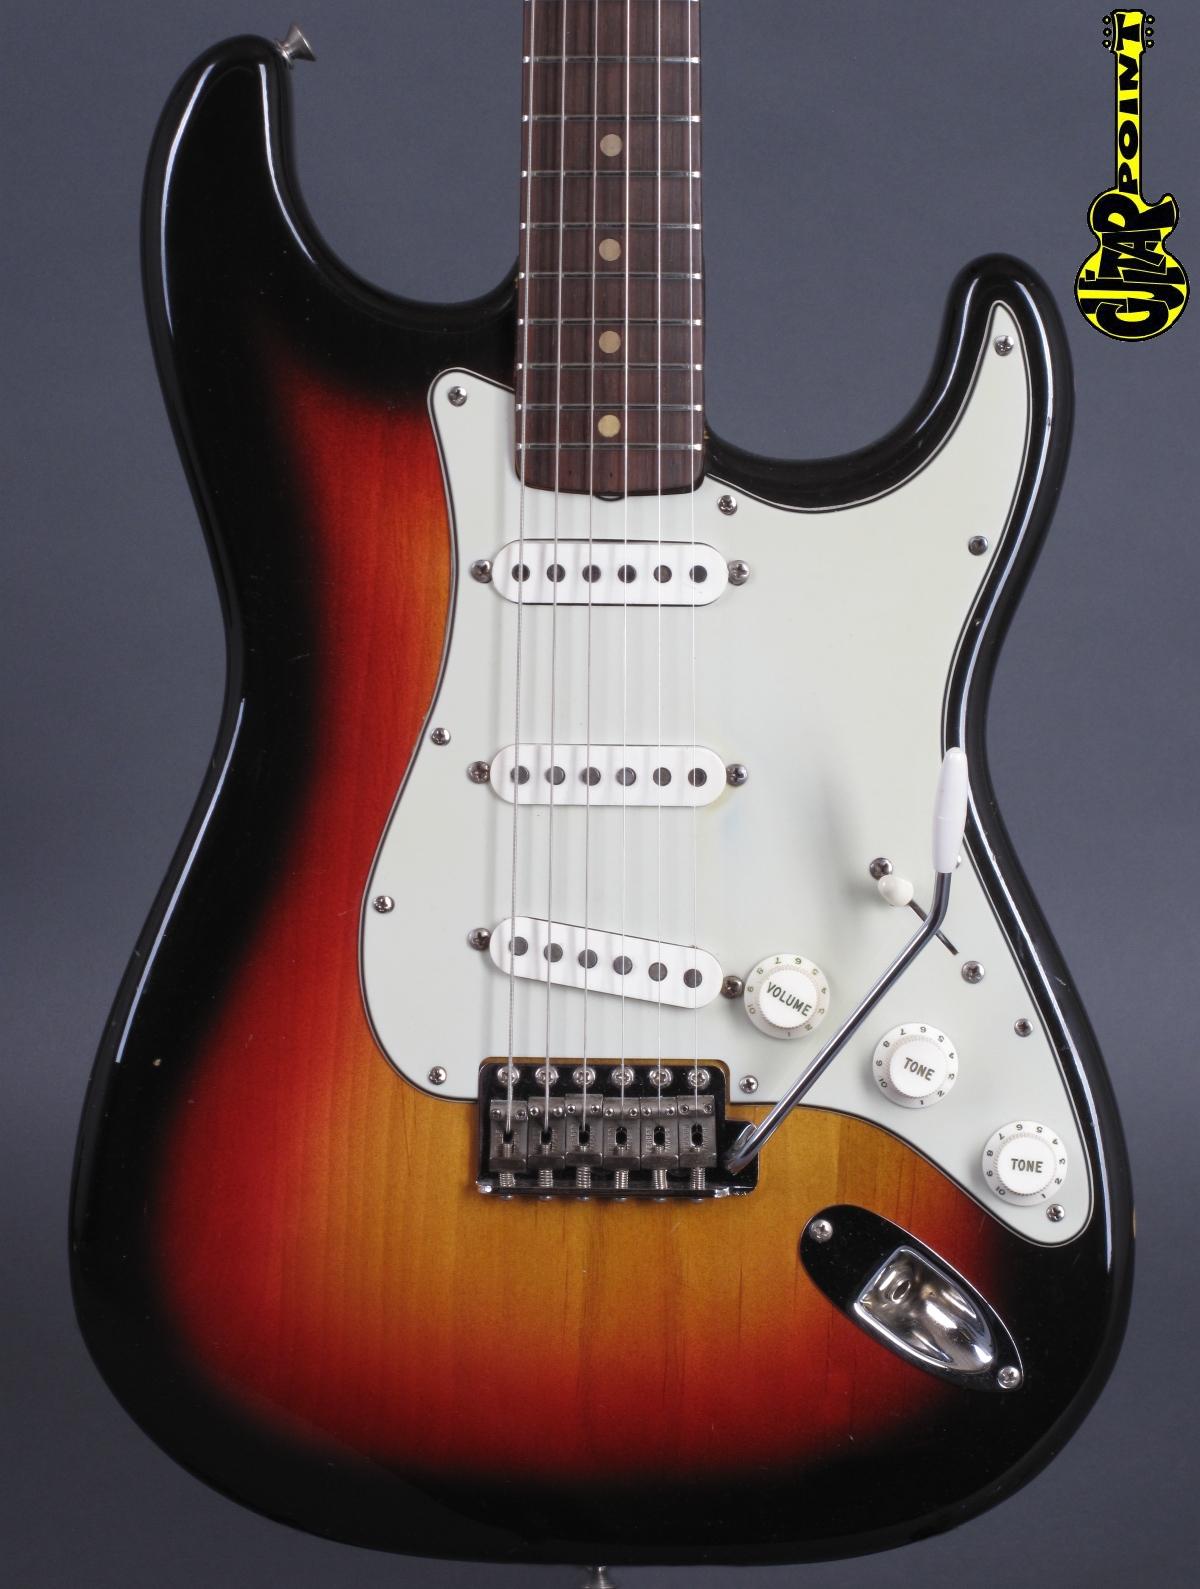 1964 Fender Stratocaster - 3-tone Sunburst   + Case Candy !